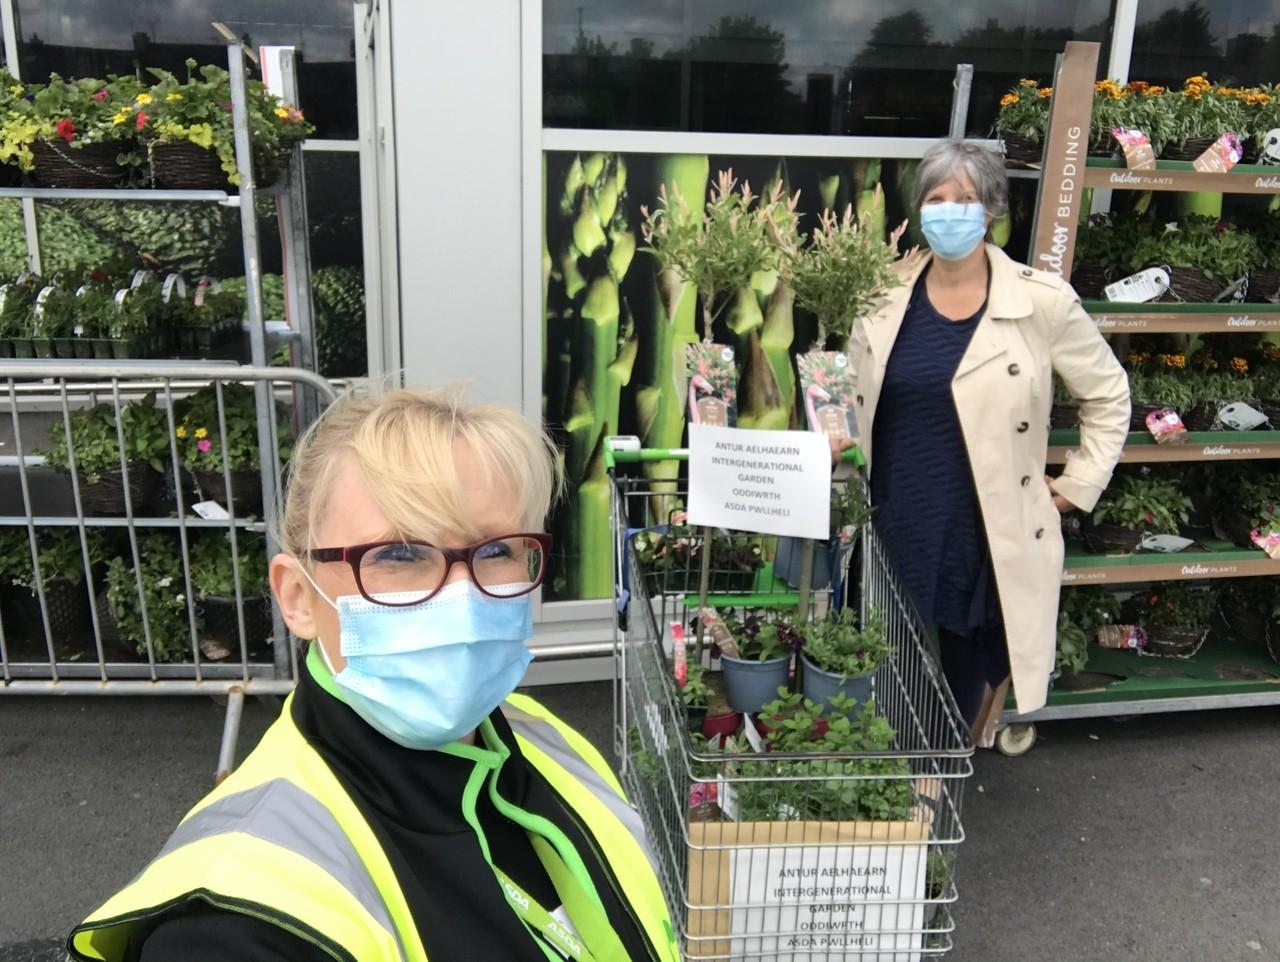 Donations to our local community garden | Asda Pwllheli